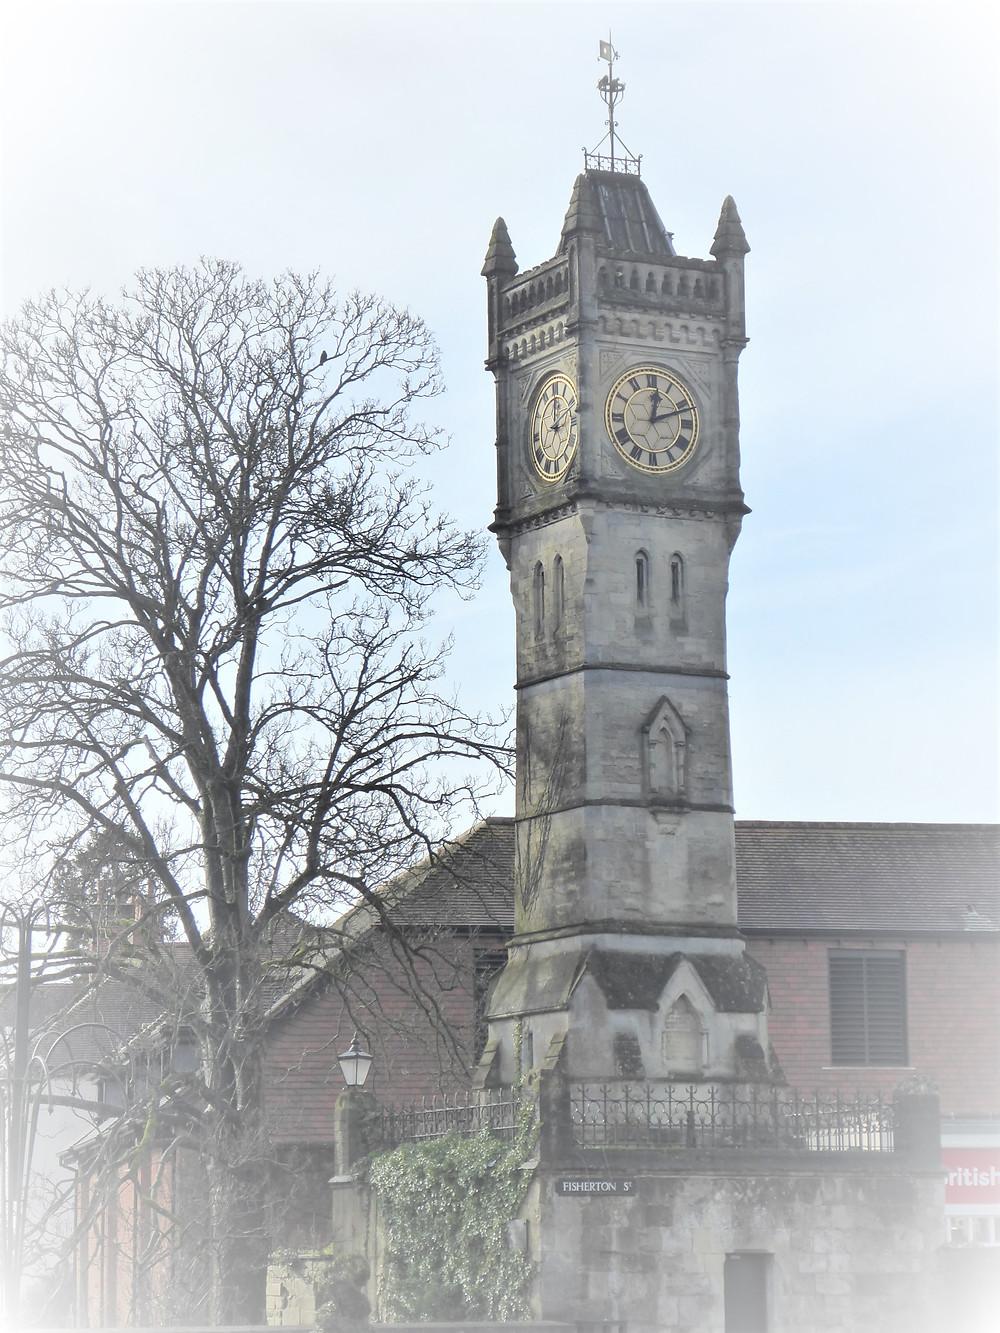 Salisbury Clock Tower by Bath Insider Tours